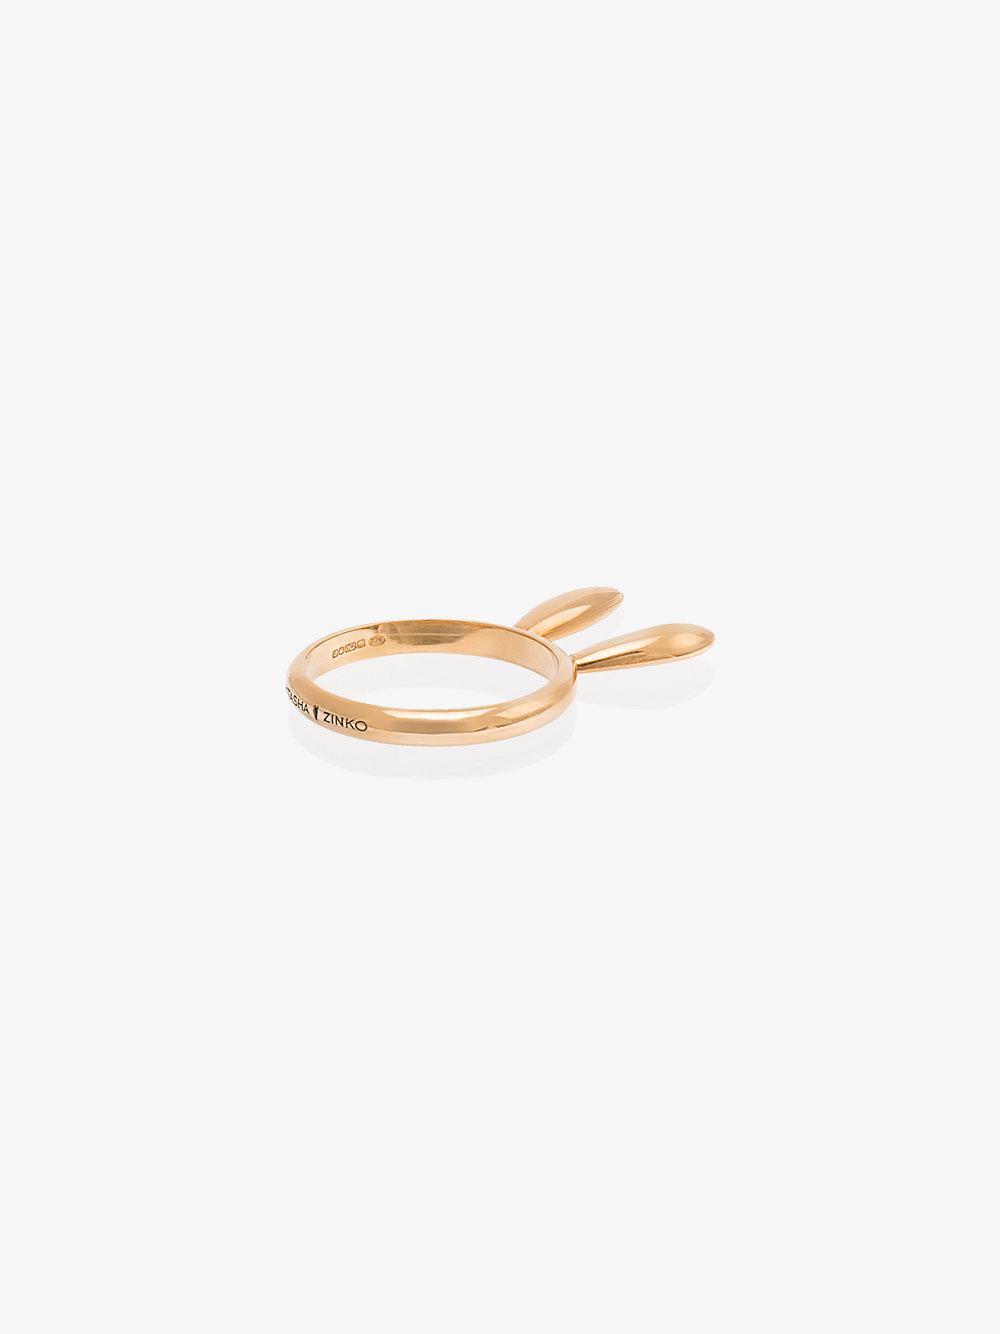 Natasha Zinko 18k Rose Gold Bunny Ears Ring in Metallic